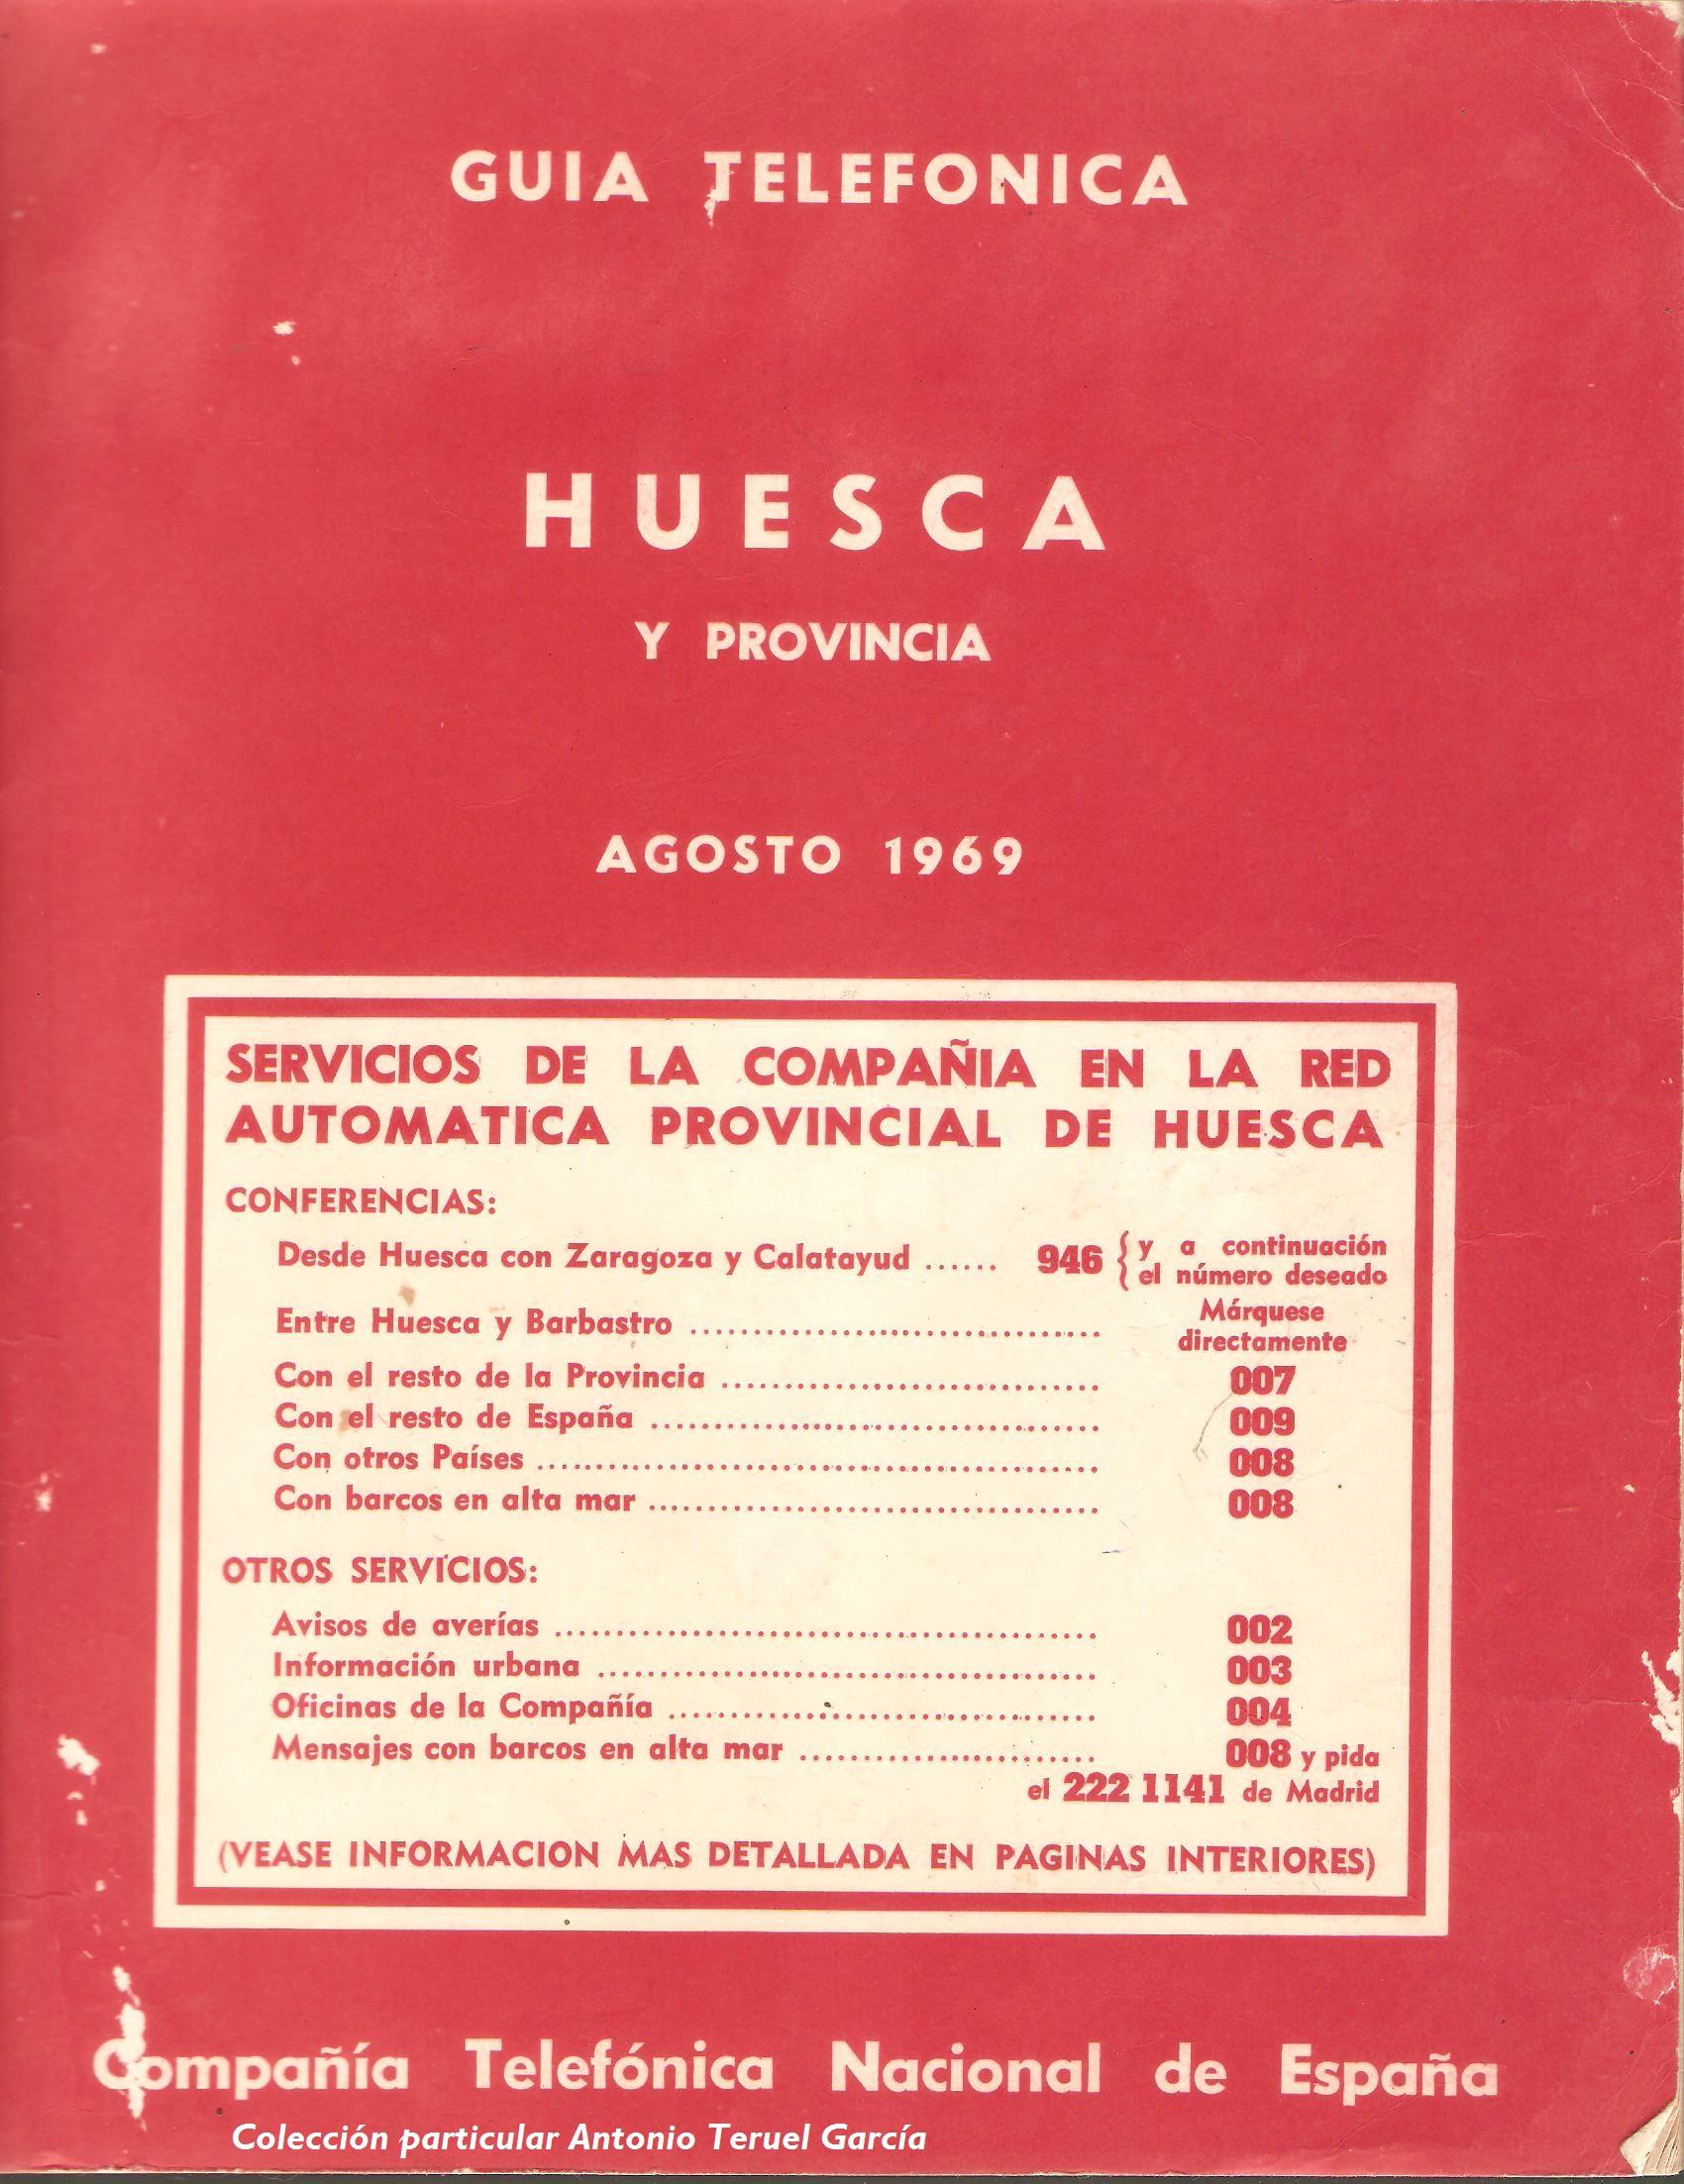 1969 Huesca